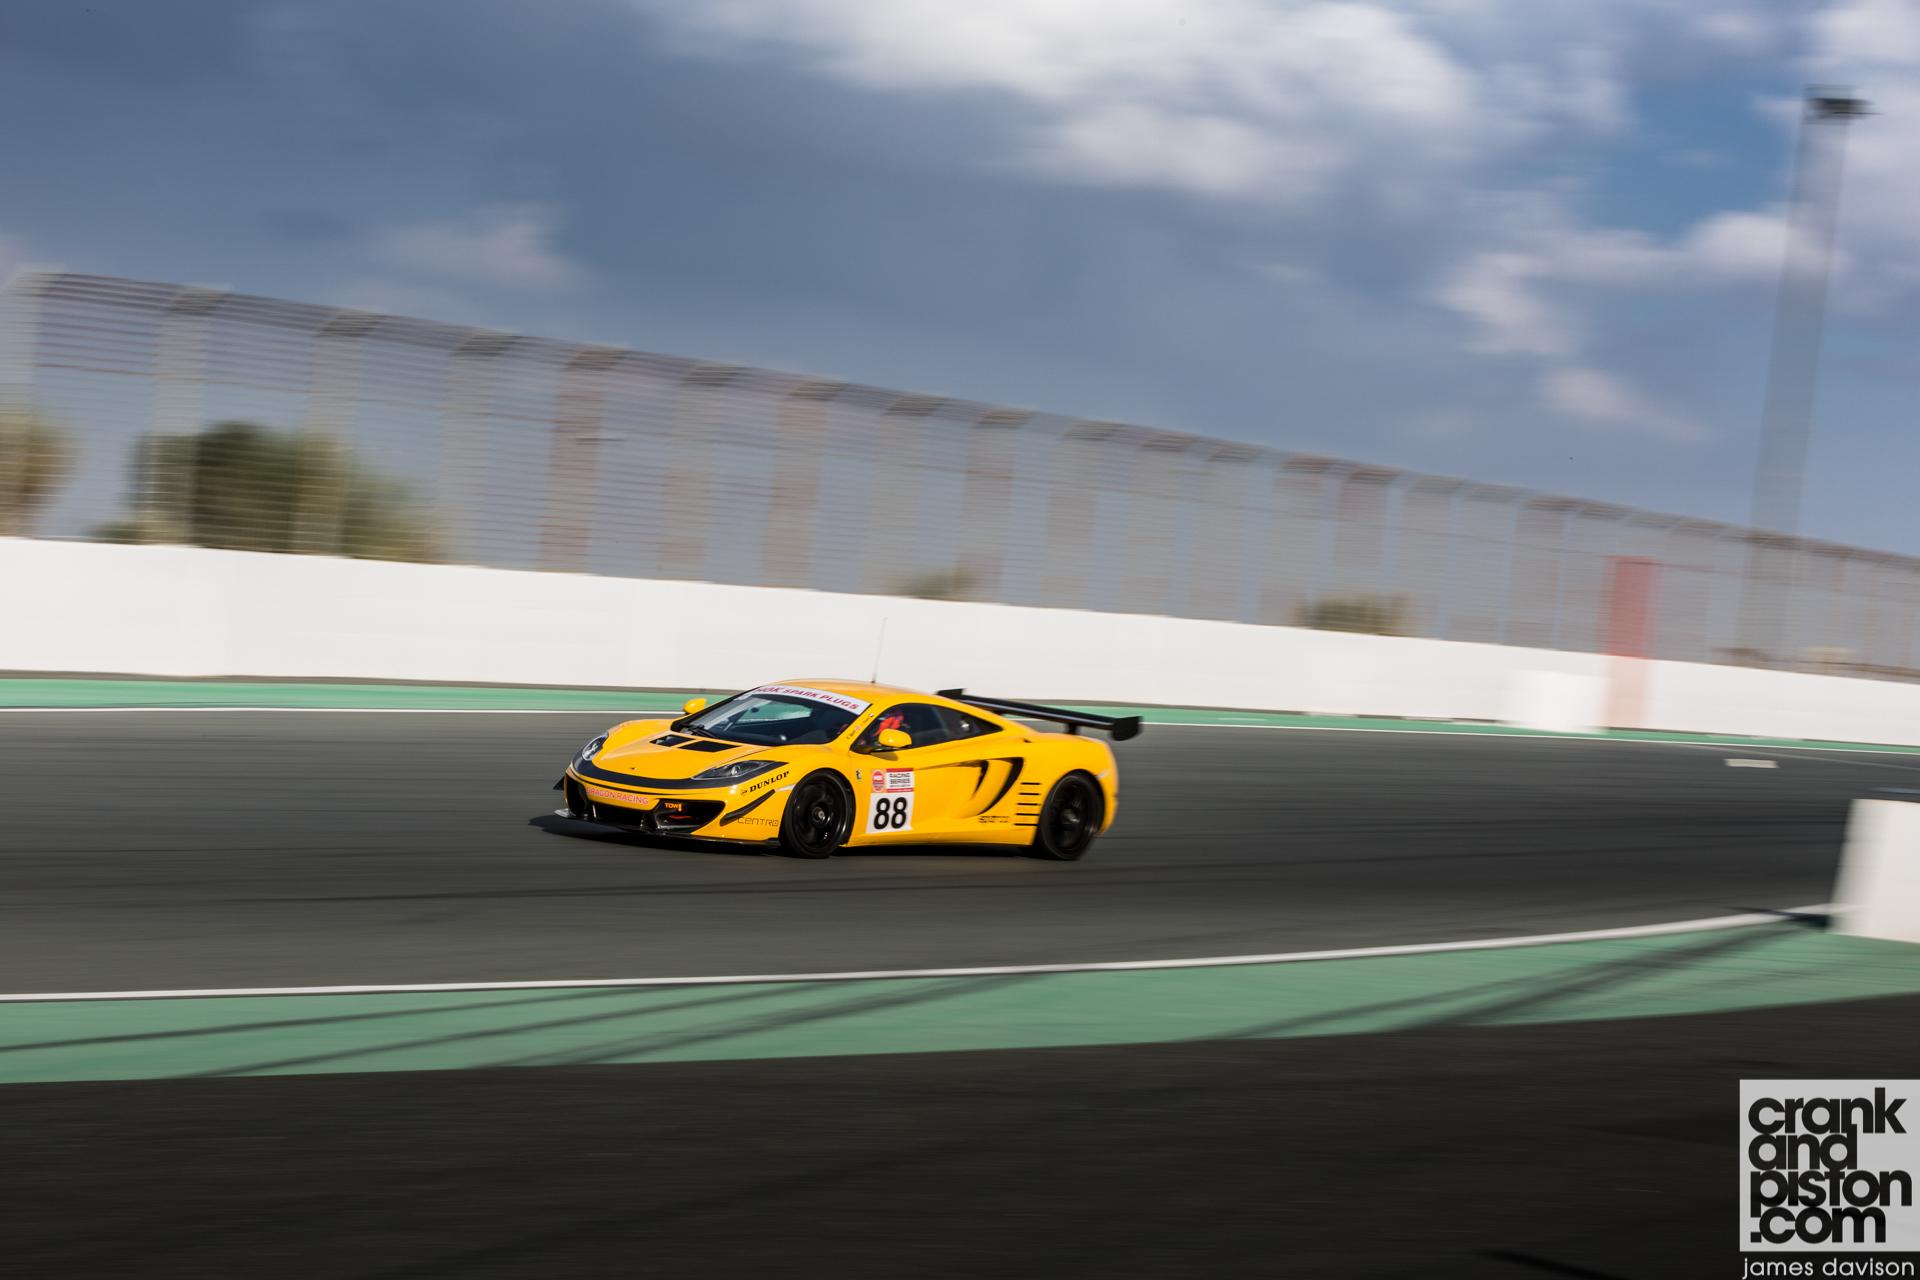 https://www.crankandpiston.com/media/2013/11/2013-2014-NGK-Enduro-Dubai-Autodrome-McLaren-12C-GT-Sprint-Wallpapers-03.jpg